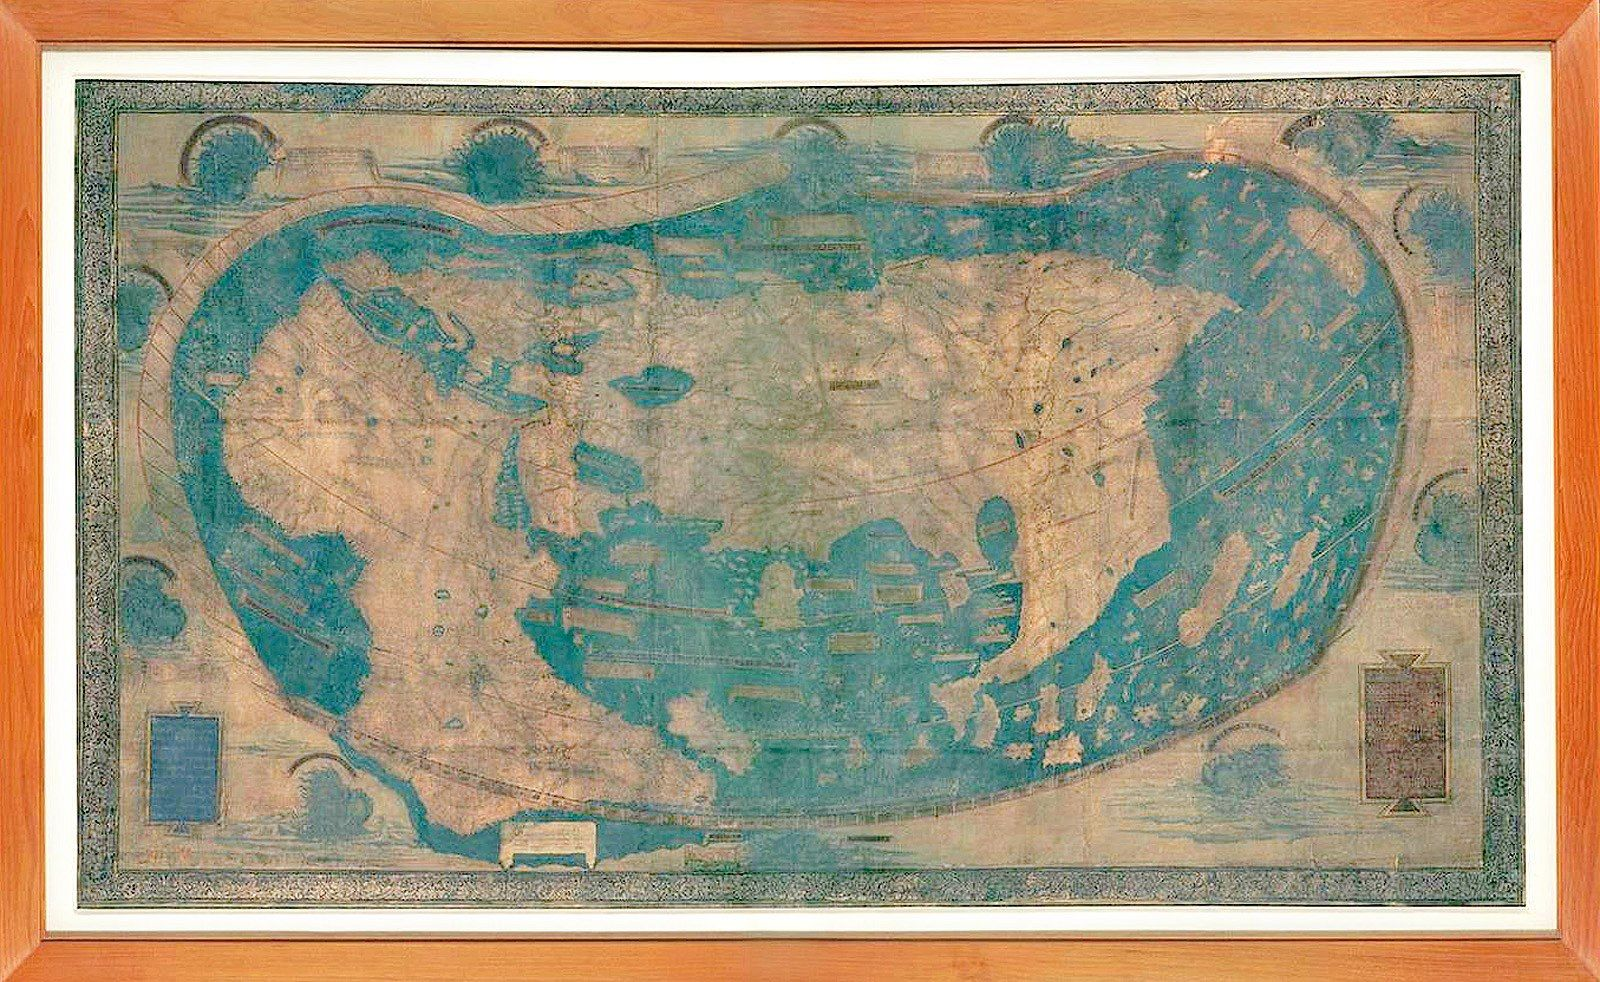 Mapa Sveta Kterou Nakreslil Nemecky Kartograf Henricus Martellus